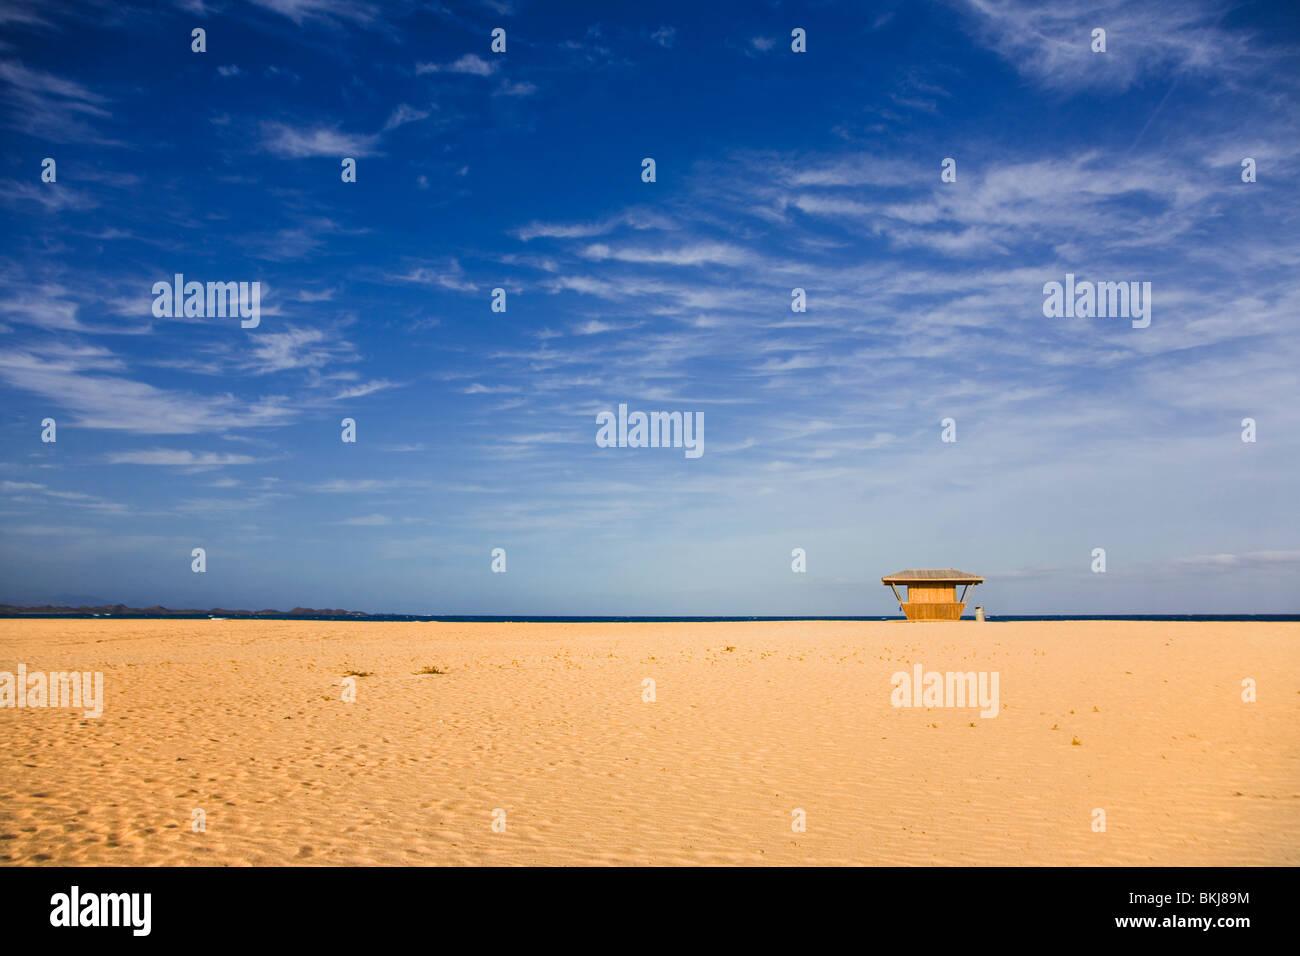 Photograph taken on Playas Grandes in Corralejos, Fuerteventura - Stock Image